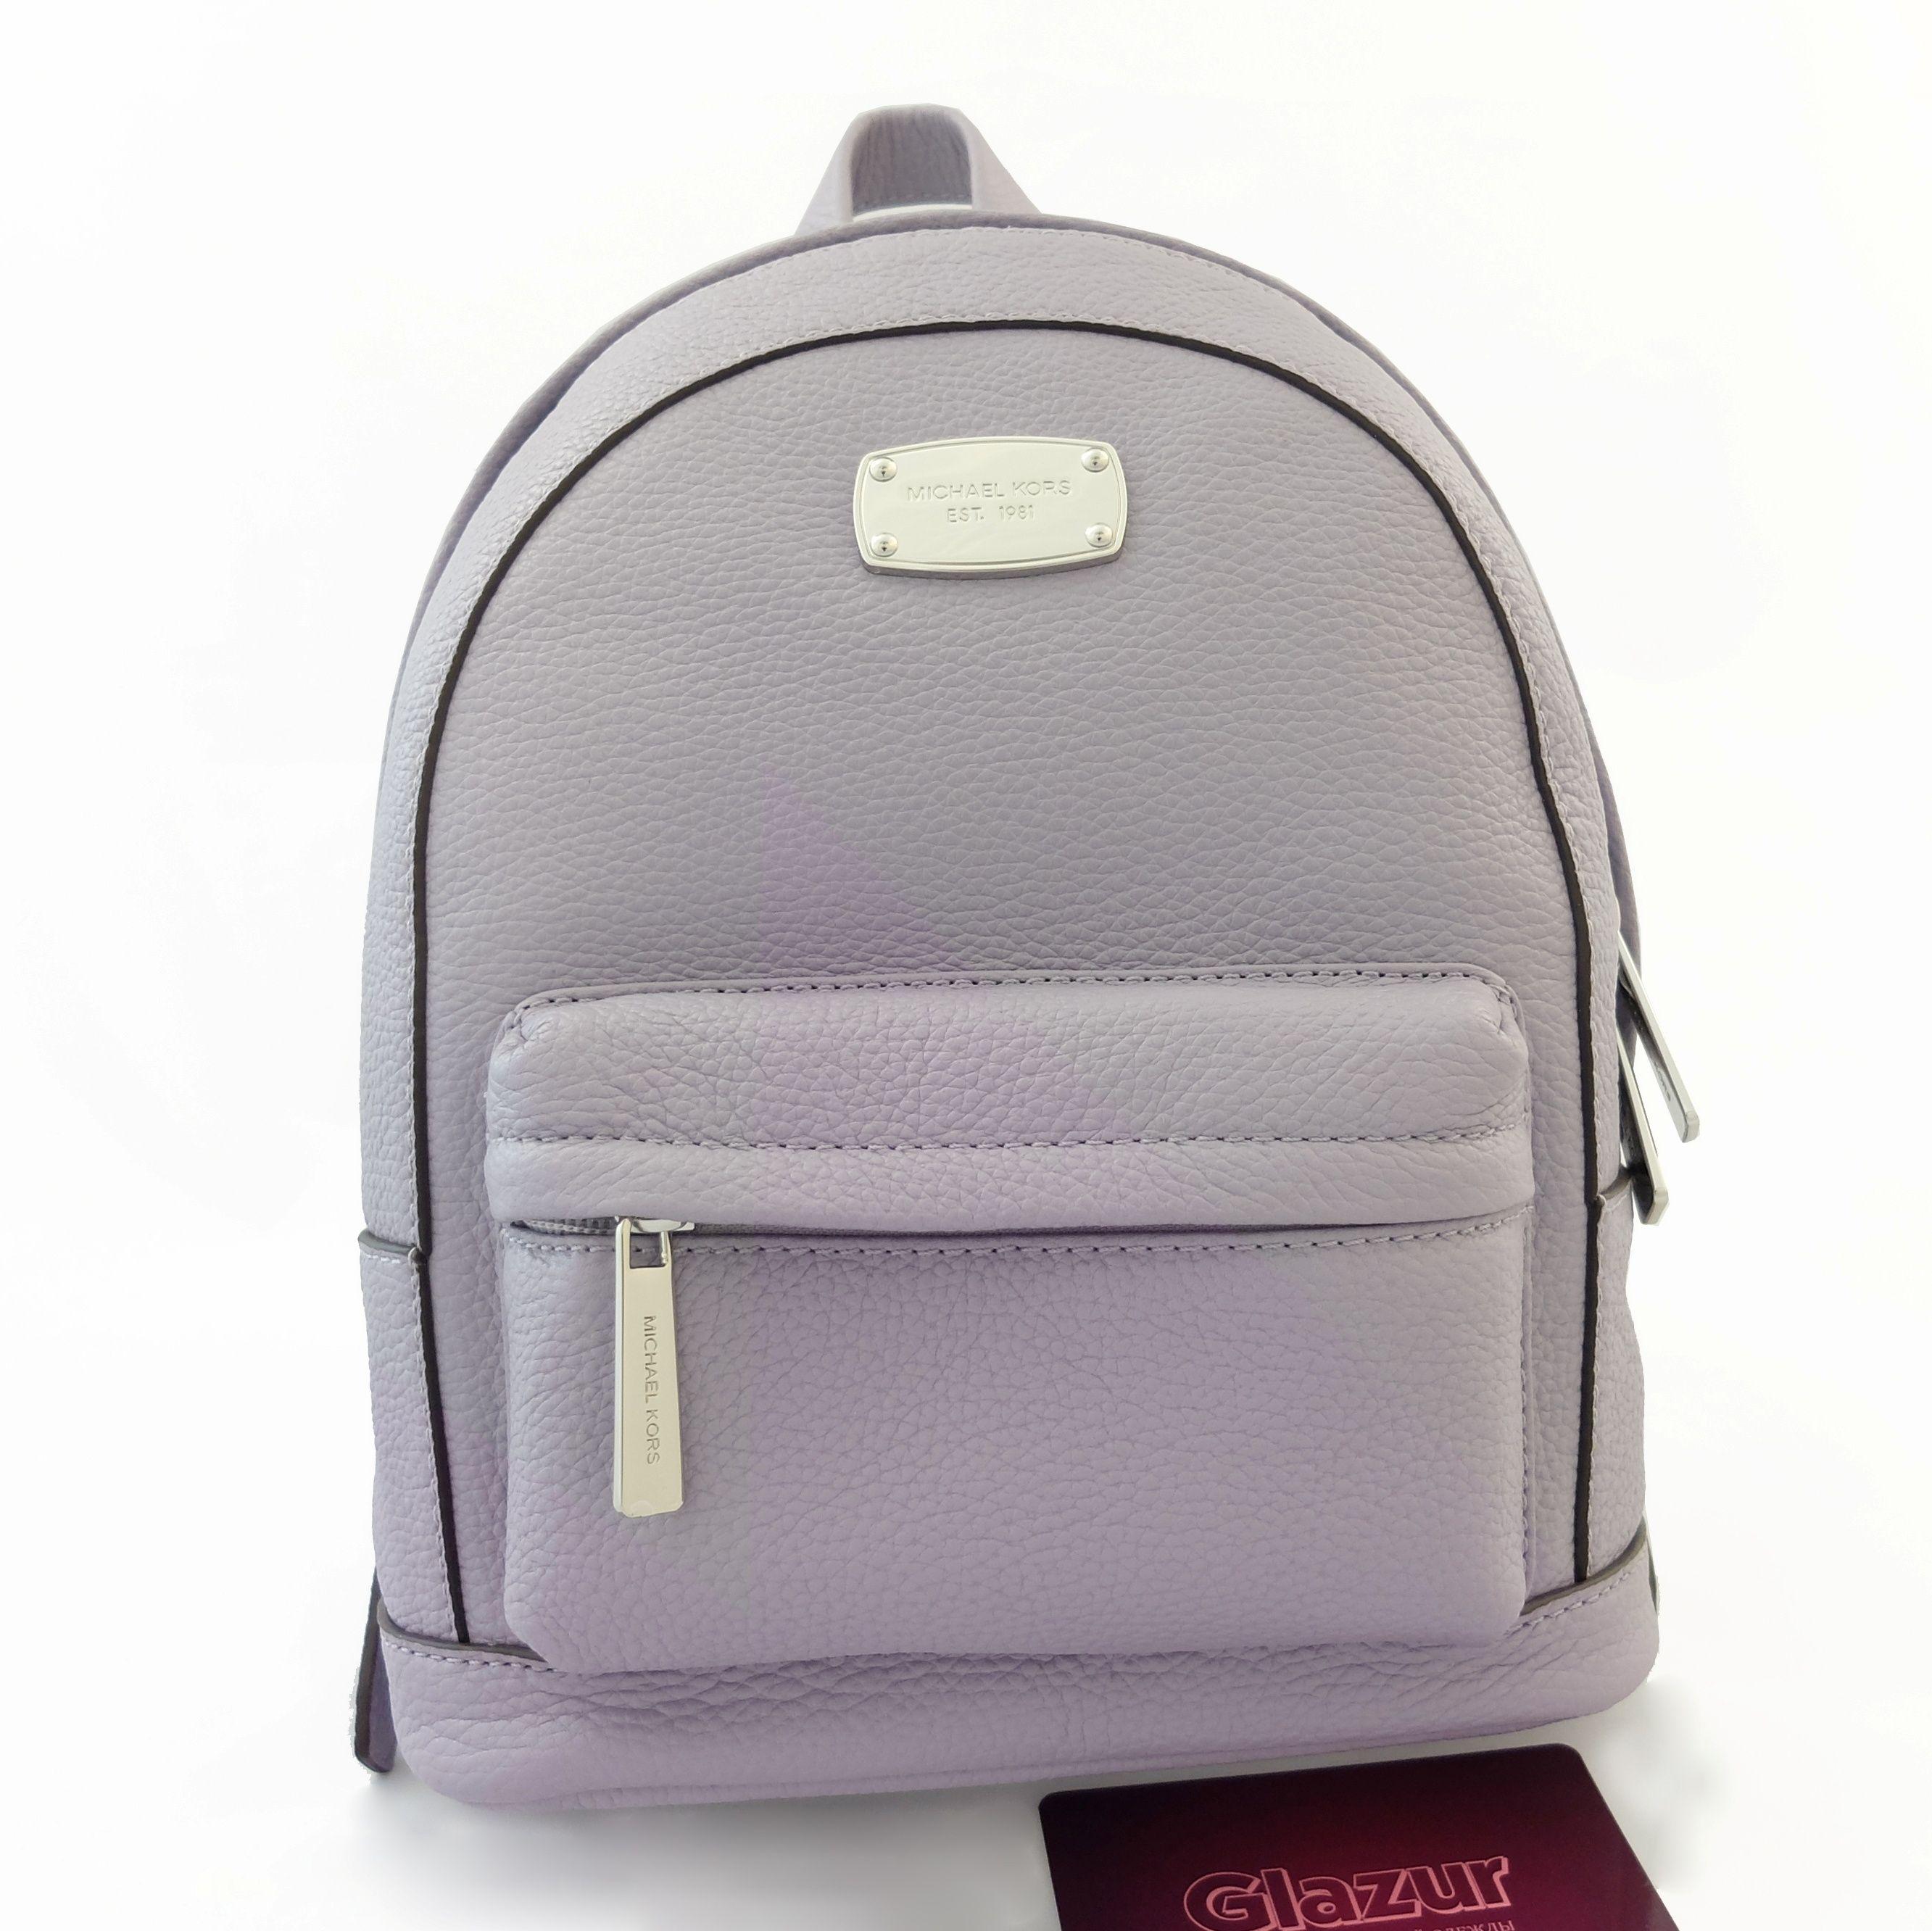 c3b4b08cfab4 ... switzerland michael kors backpack original 12073 81782 d6c03